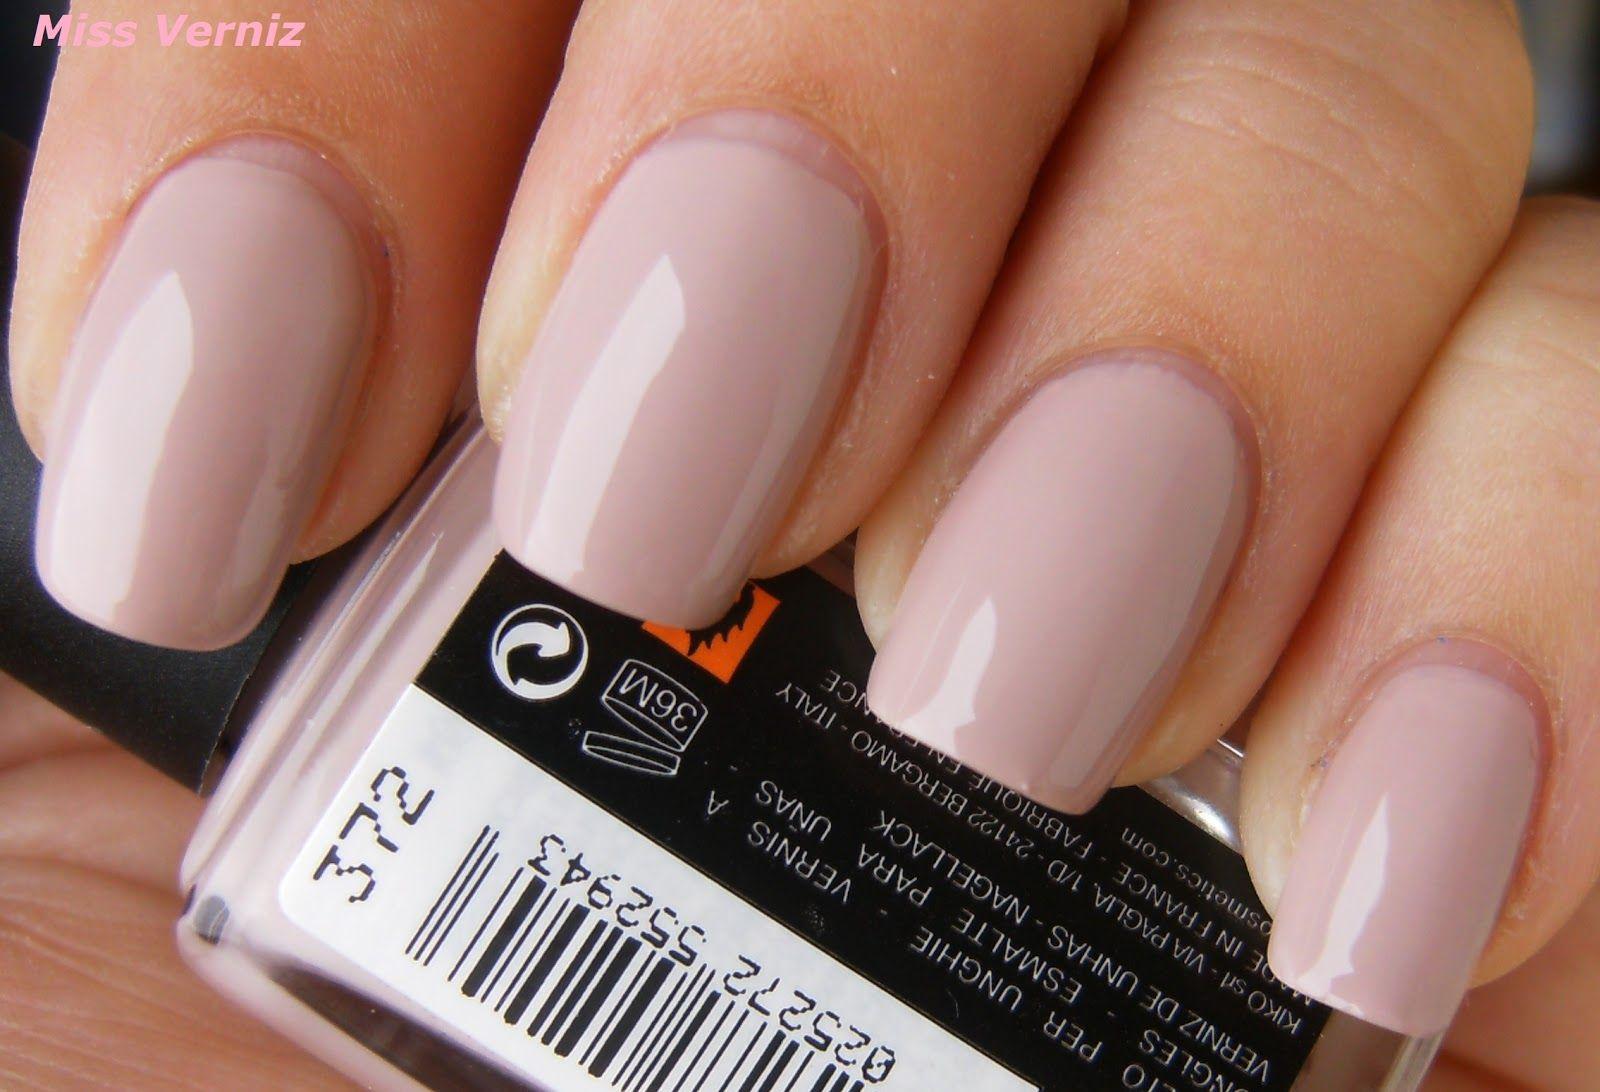 Kiko+Numero+372+Nude | Nail Art | Pinterest | Nude, Makeup and Manicure